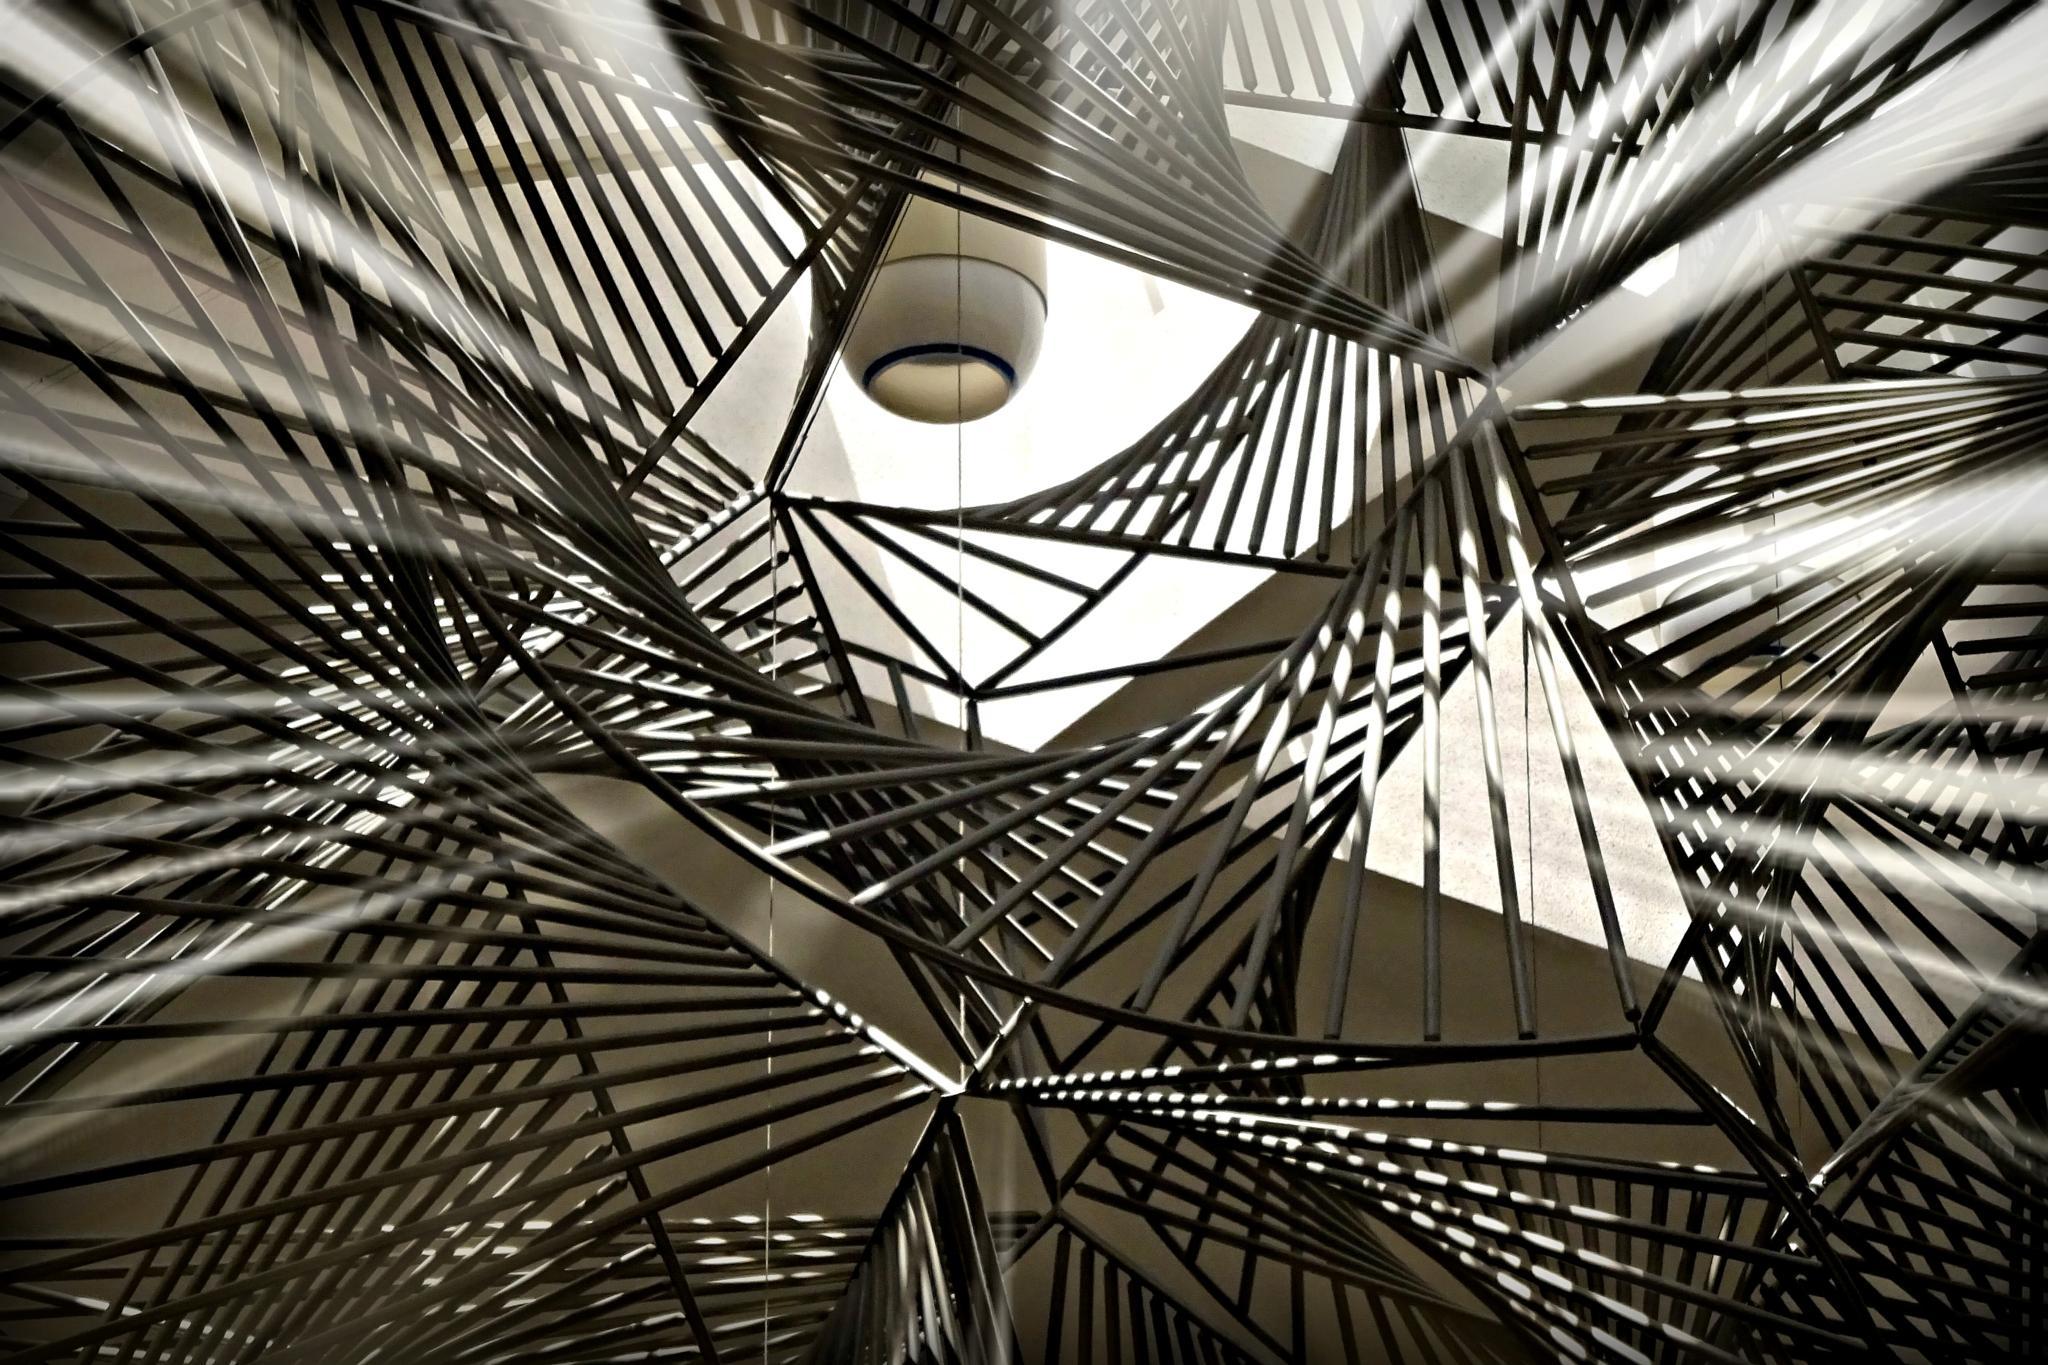 Steel design by gudrun.jones